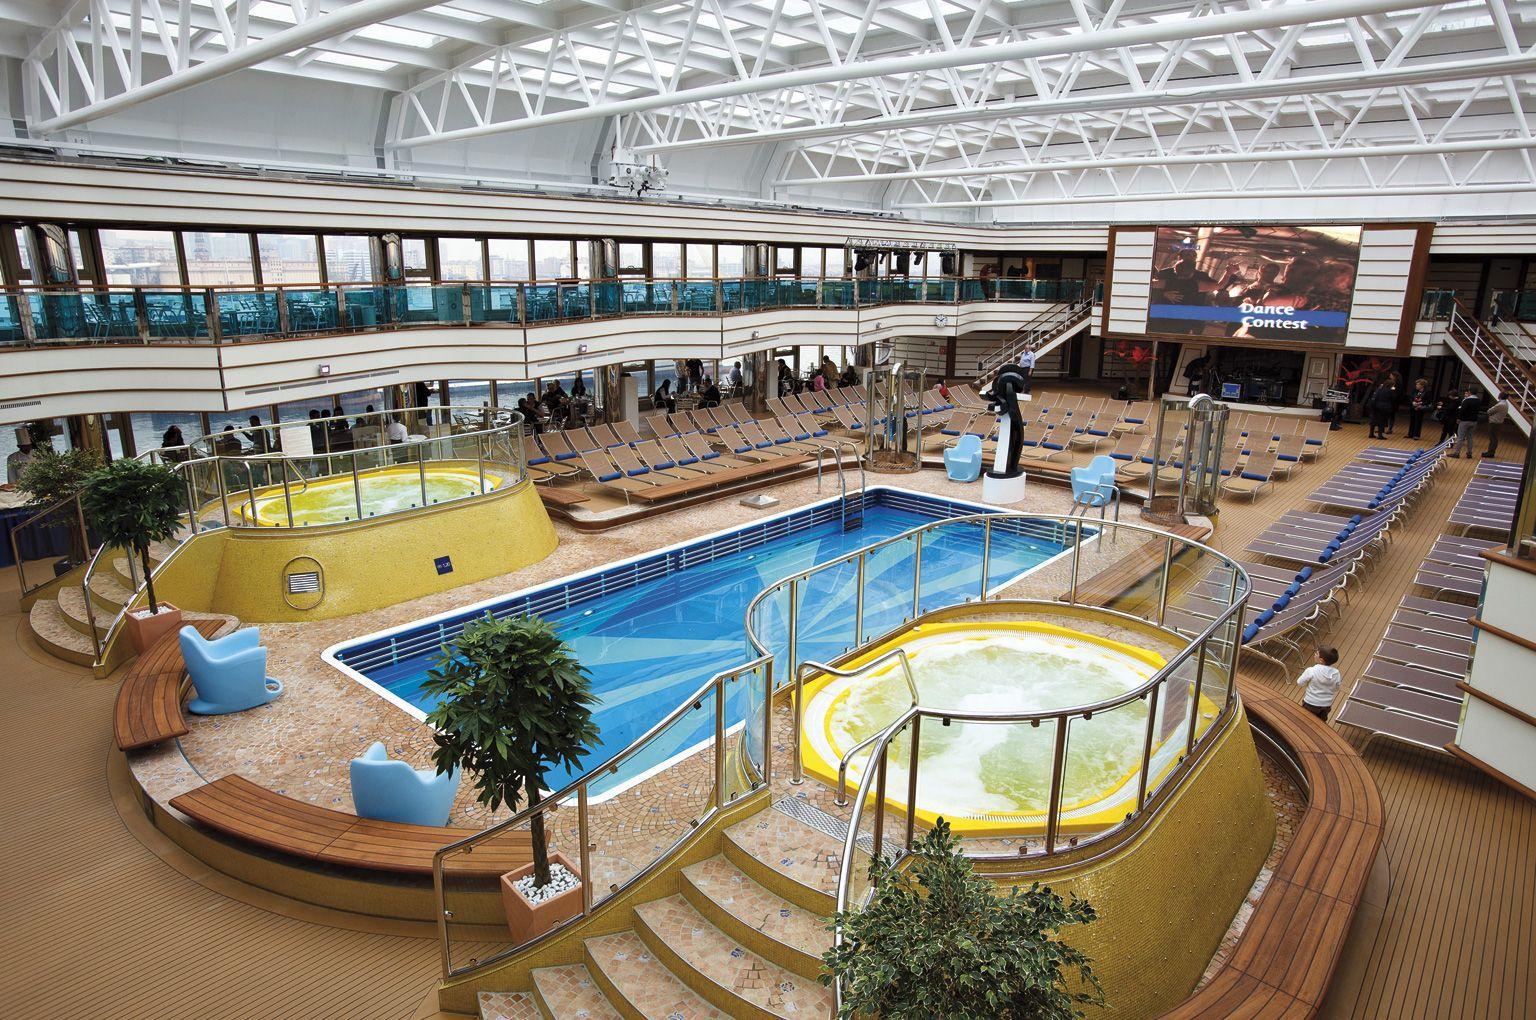 #CostaDeliziosa #Costa #CostaKreuzfahrten #CostaCrociere #Pool #Pooldeck #Poollandschaft #Kreuzfahrtschiff #cruise #Kreuzfahrt #Kreuzfahrtberater #Urlaub #Reise #Schiffsreise #travel #vacation